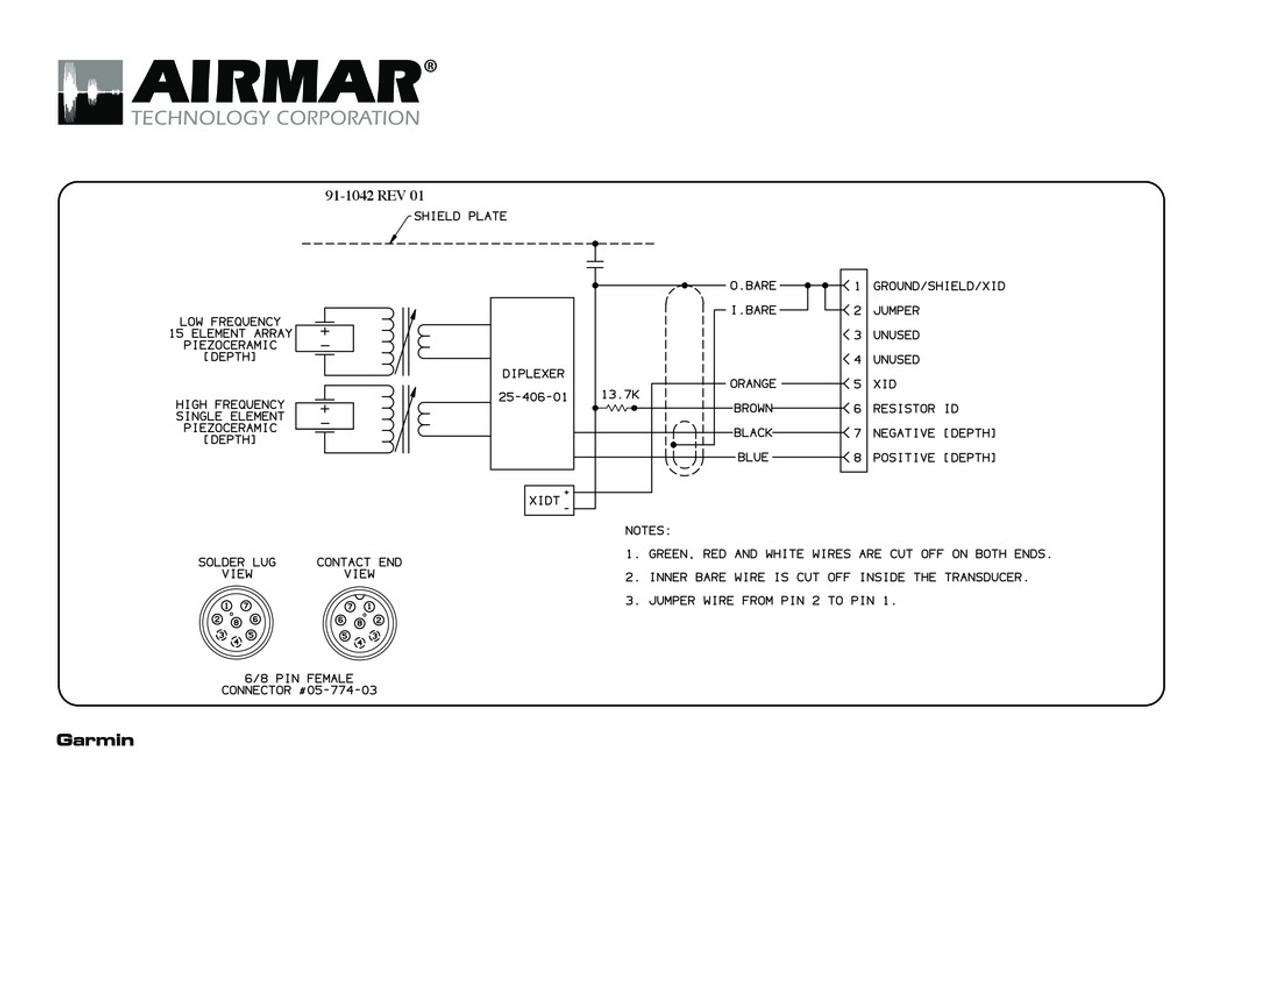 small resolution of  garmin garmin marine wiring diagrams on garmin network cable wiring garmin 3010c wiring garmin speedometer